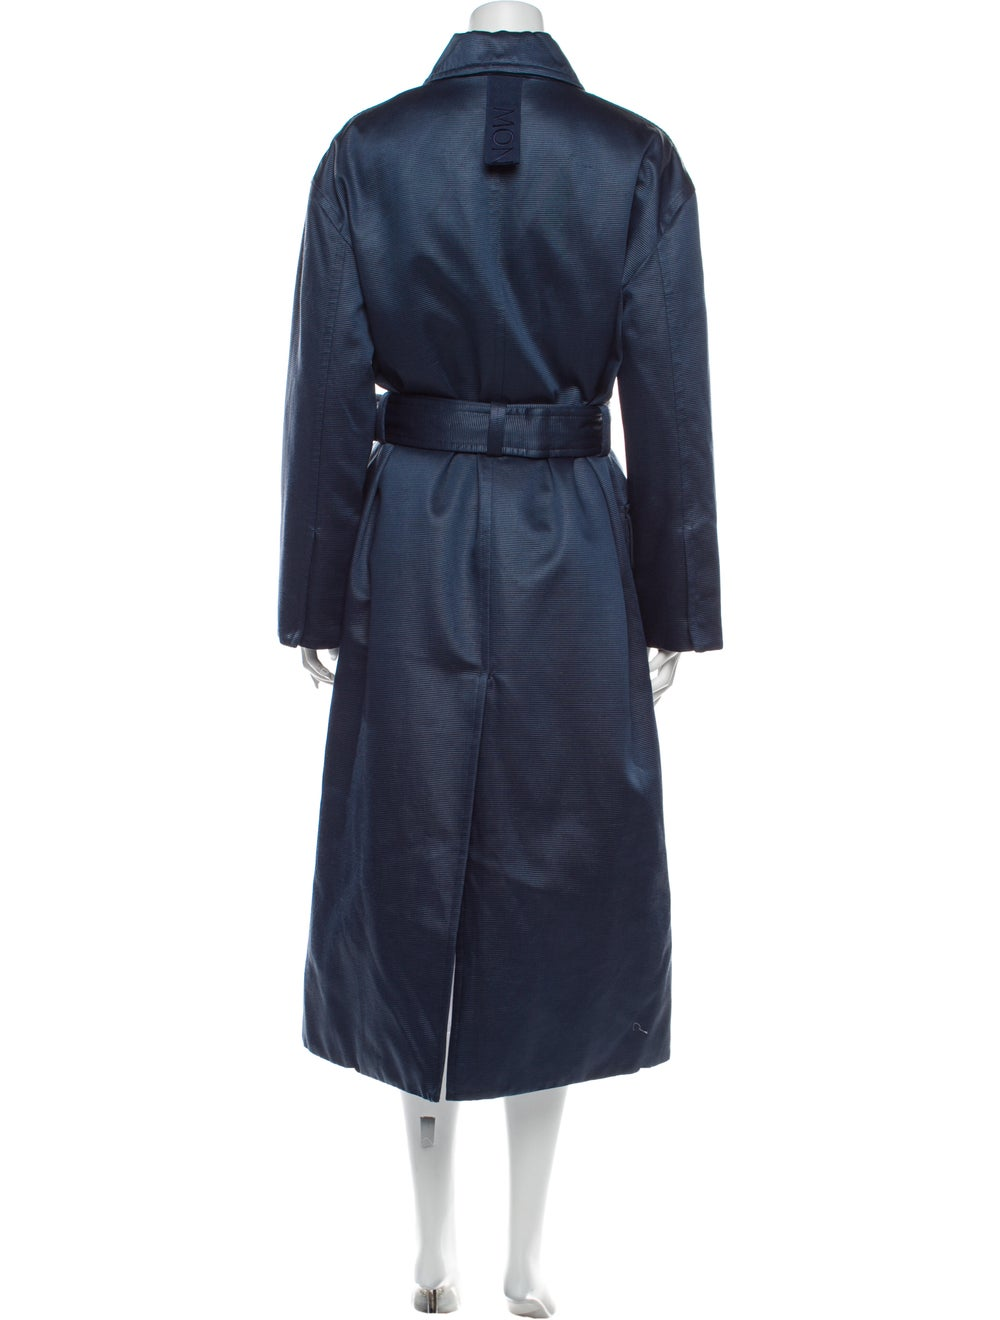 Moncler Genius Marigold Striped Trench Coat w/ Ta… - image 3